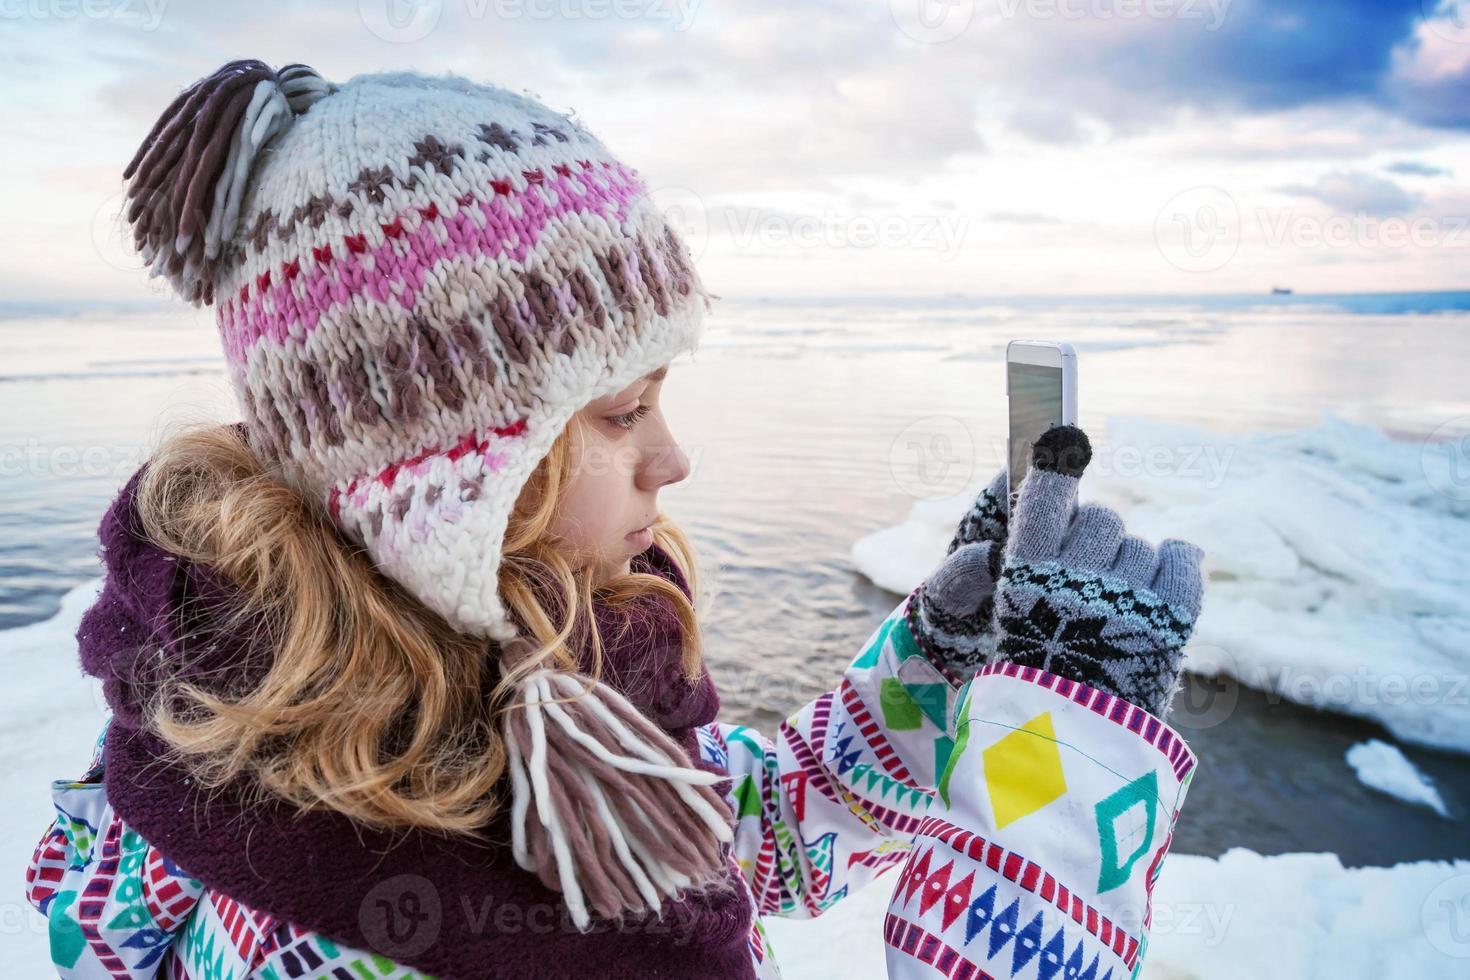 klein blond Kaukasisch meisje fotograferen op haar smartphone foto